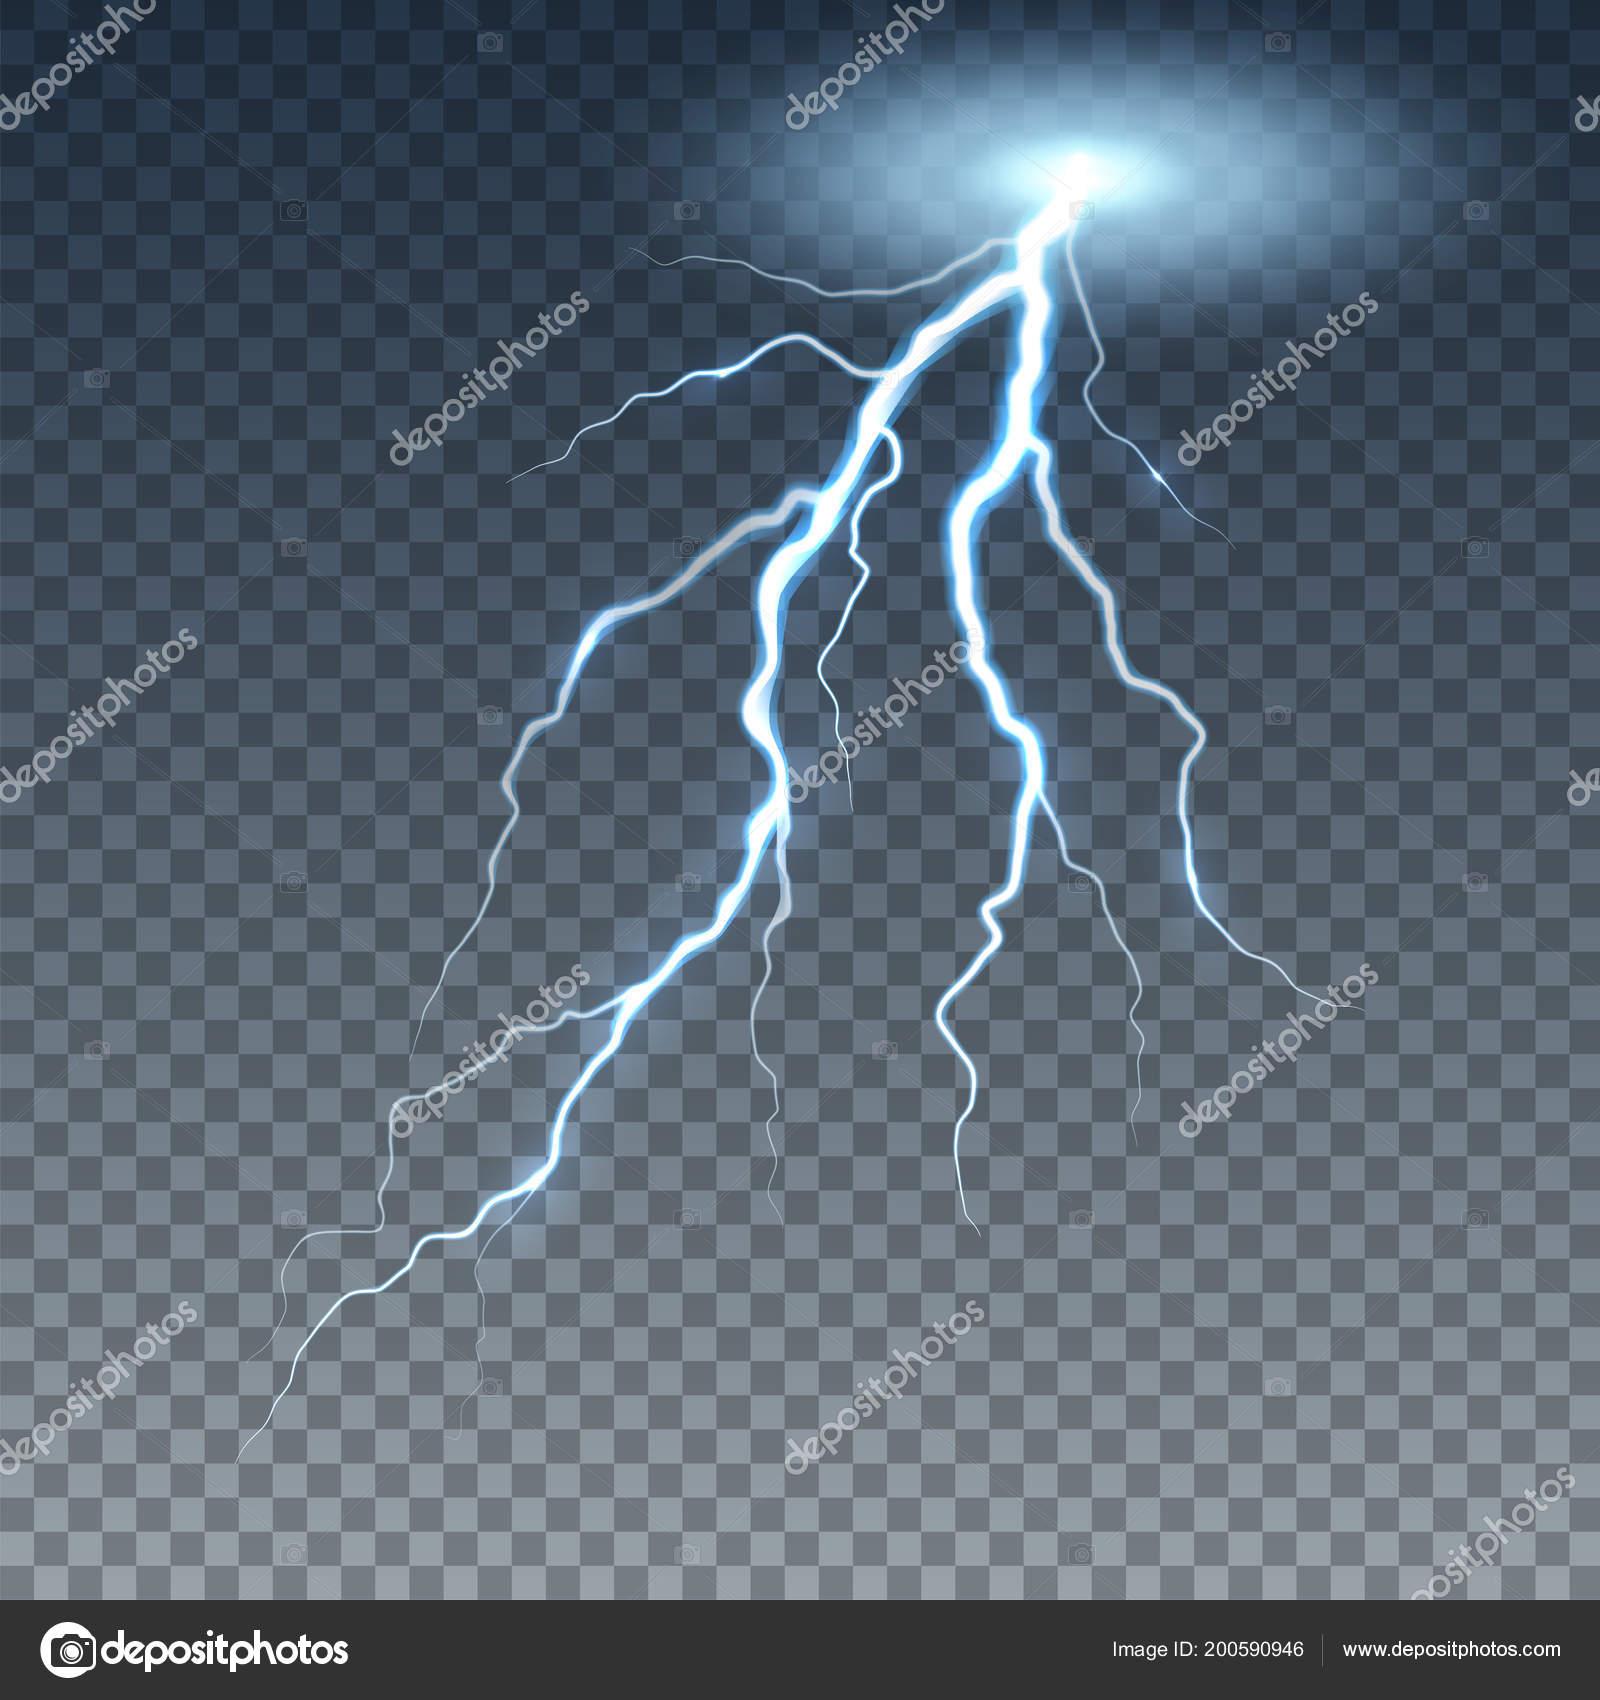 Realistic Lightning And Thunder Bolt Stock Vector